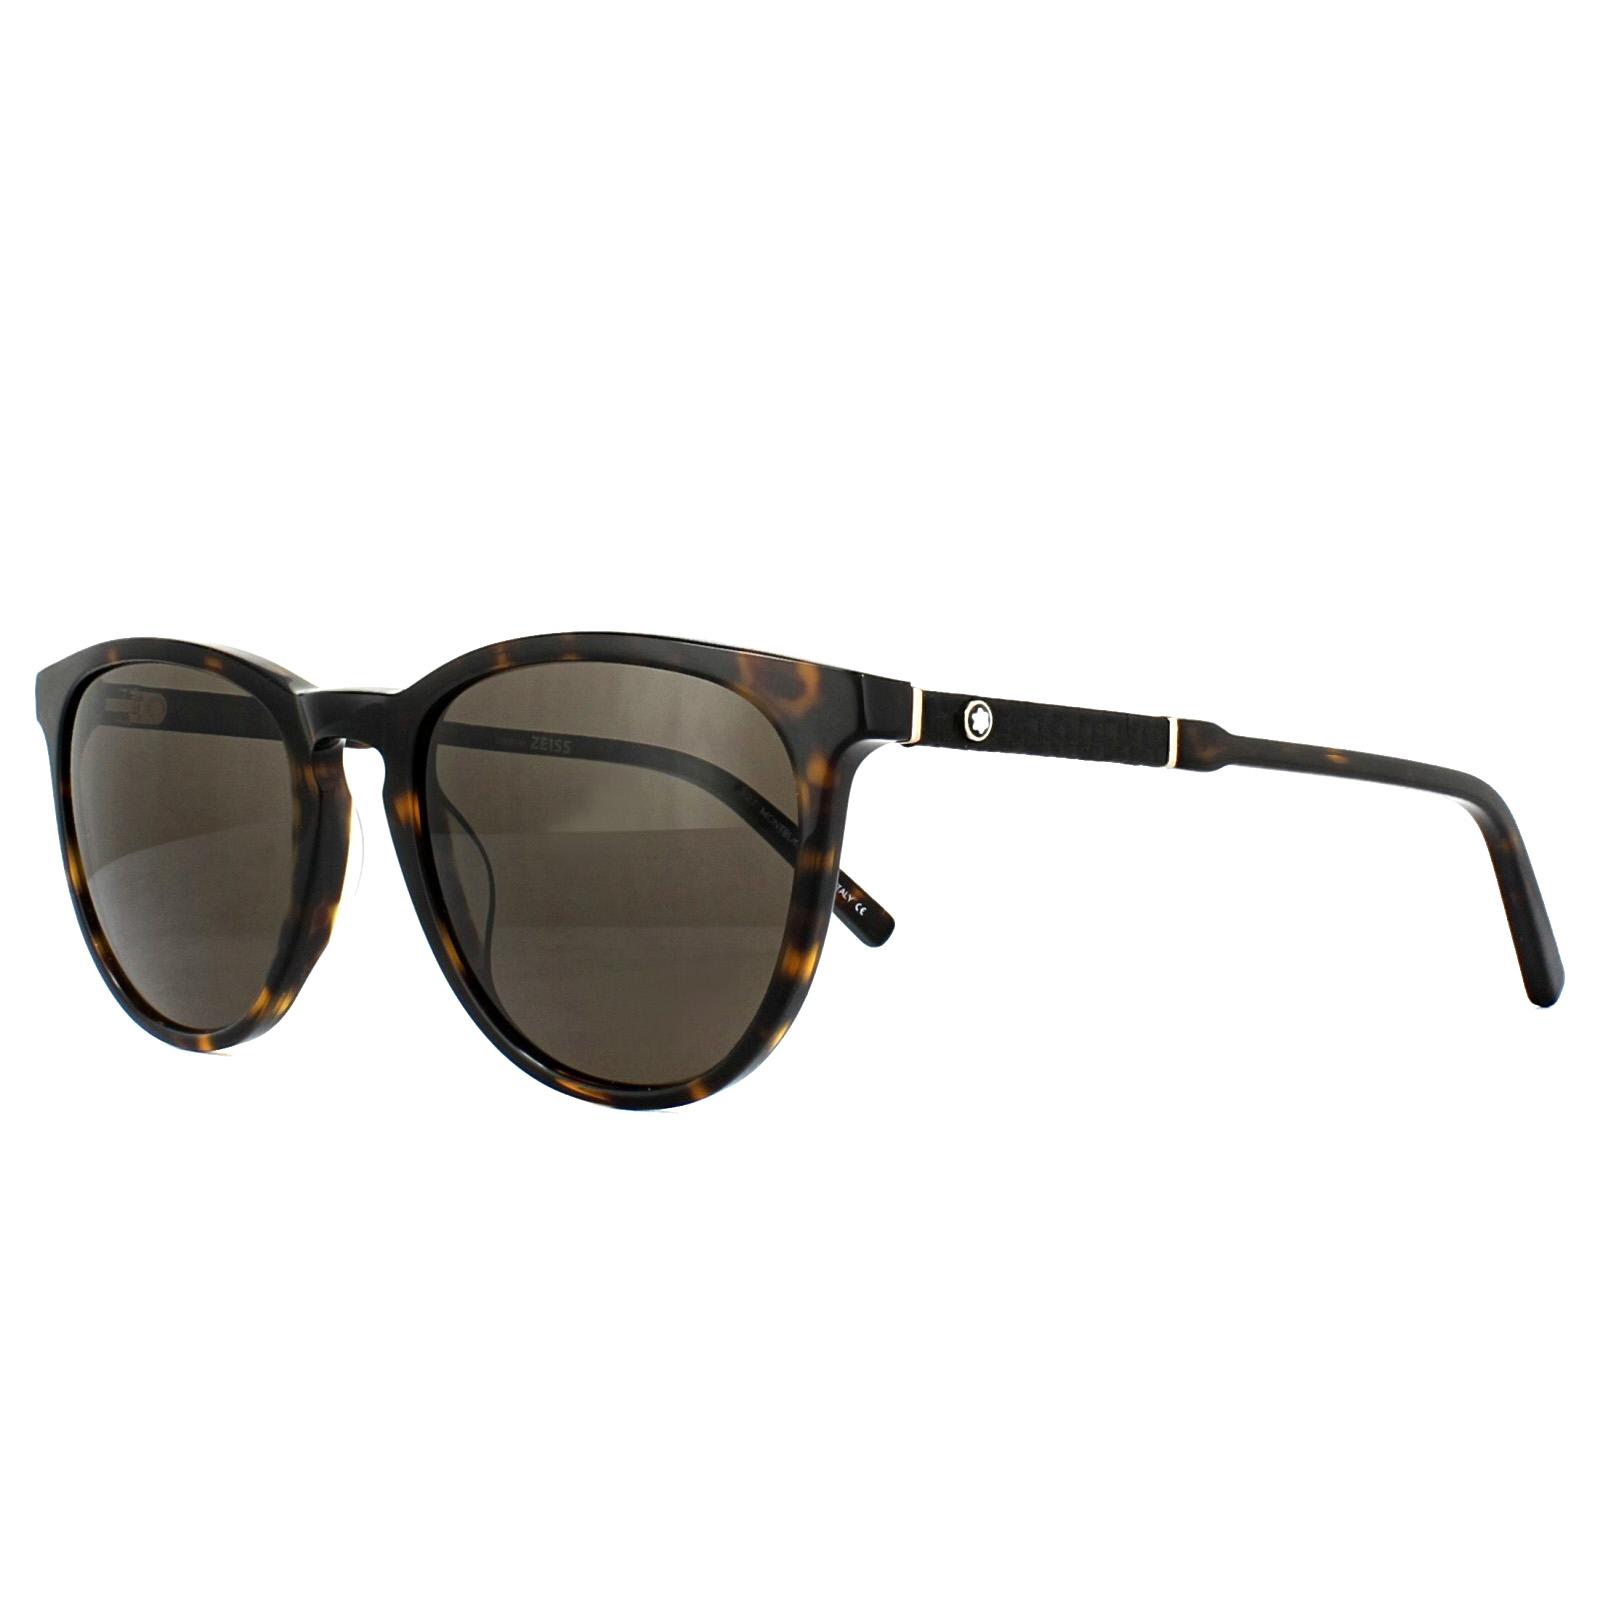 68104e7b0c9f Sentinel Mont Blanc Sunglasses MB588S 52E Dark Havana Brown